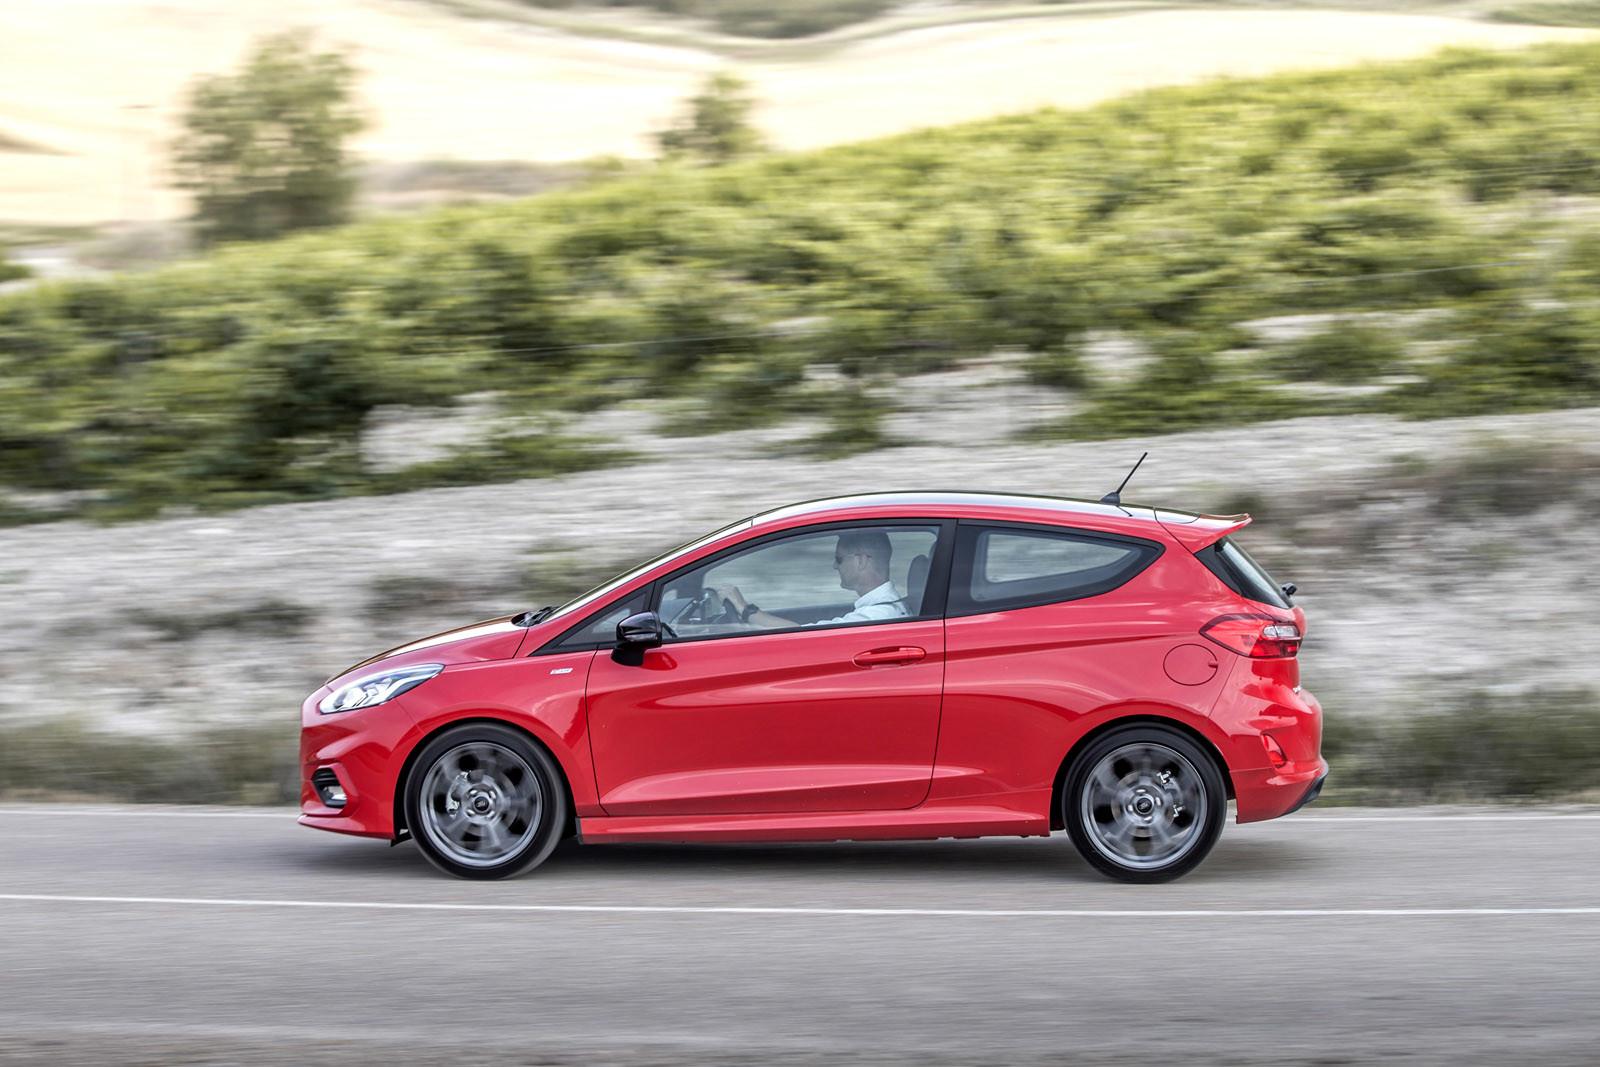 Foto de Ford Fiesta 2017, toma de contacto (15/192)